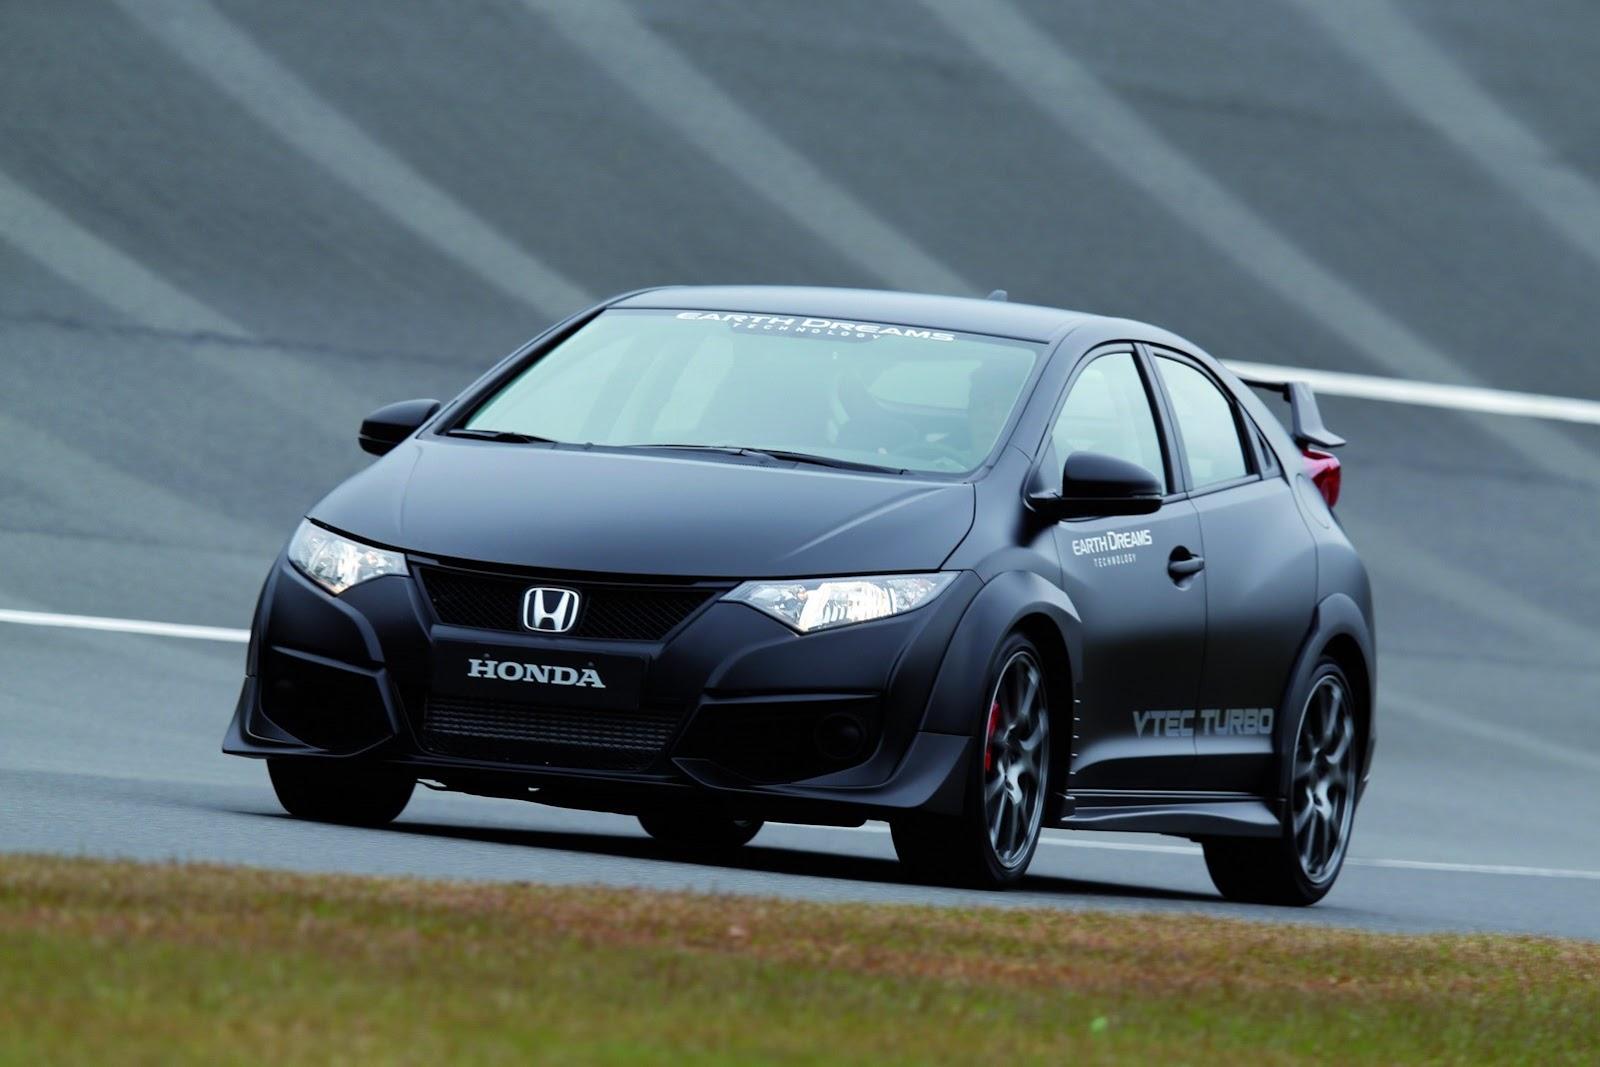 Honda Reveals New Civic Type R With VTEC TURBO Engine